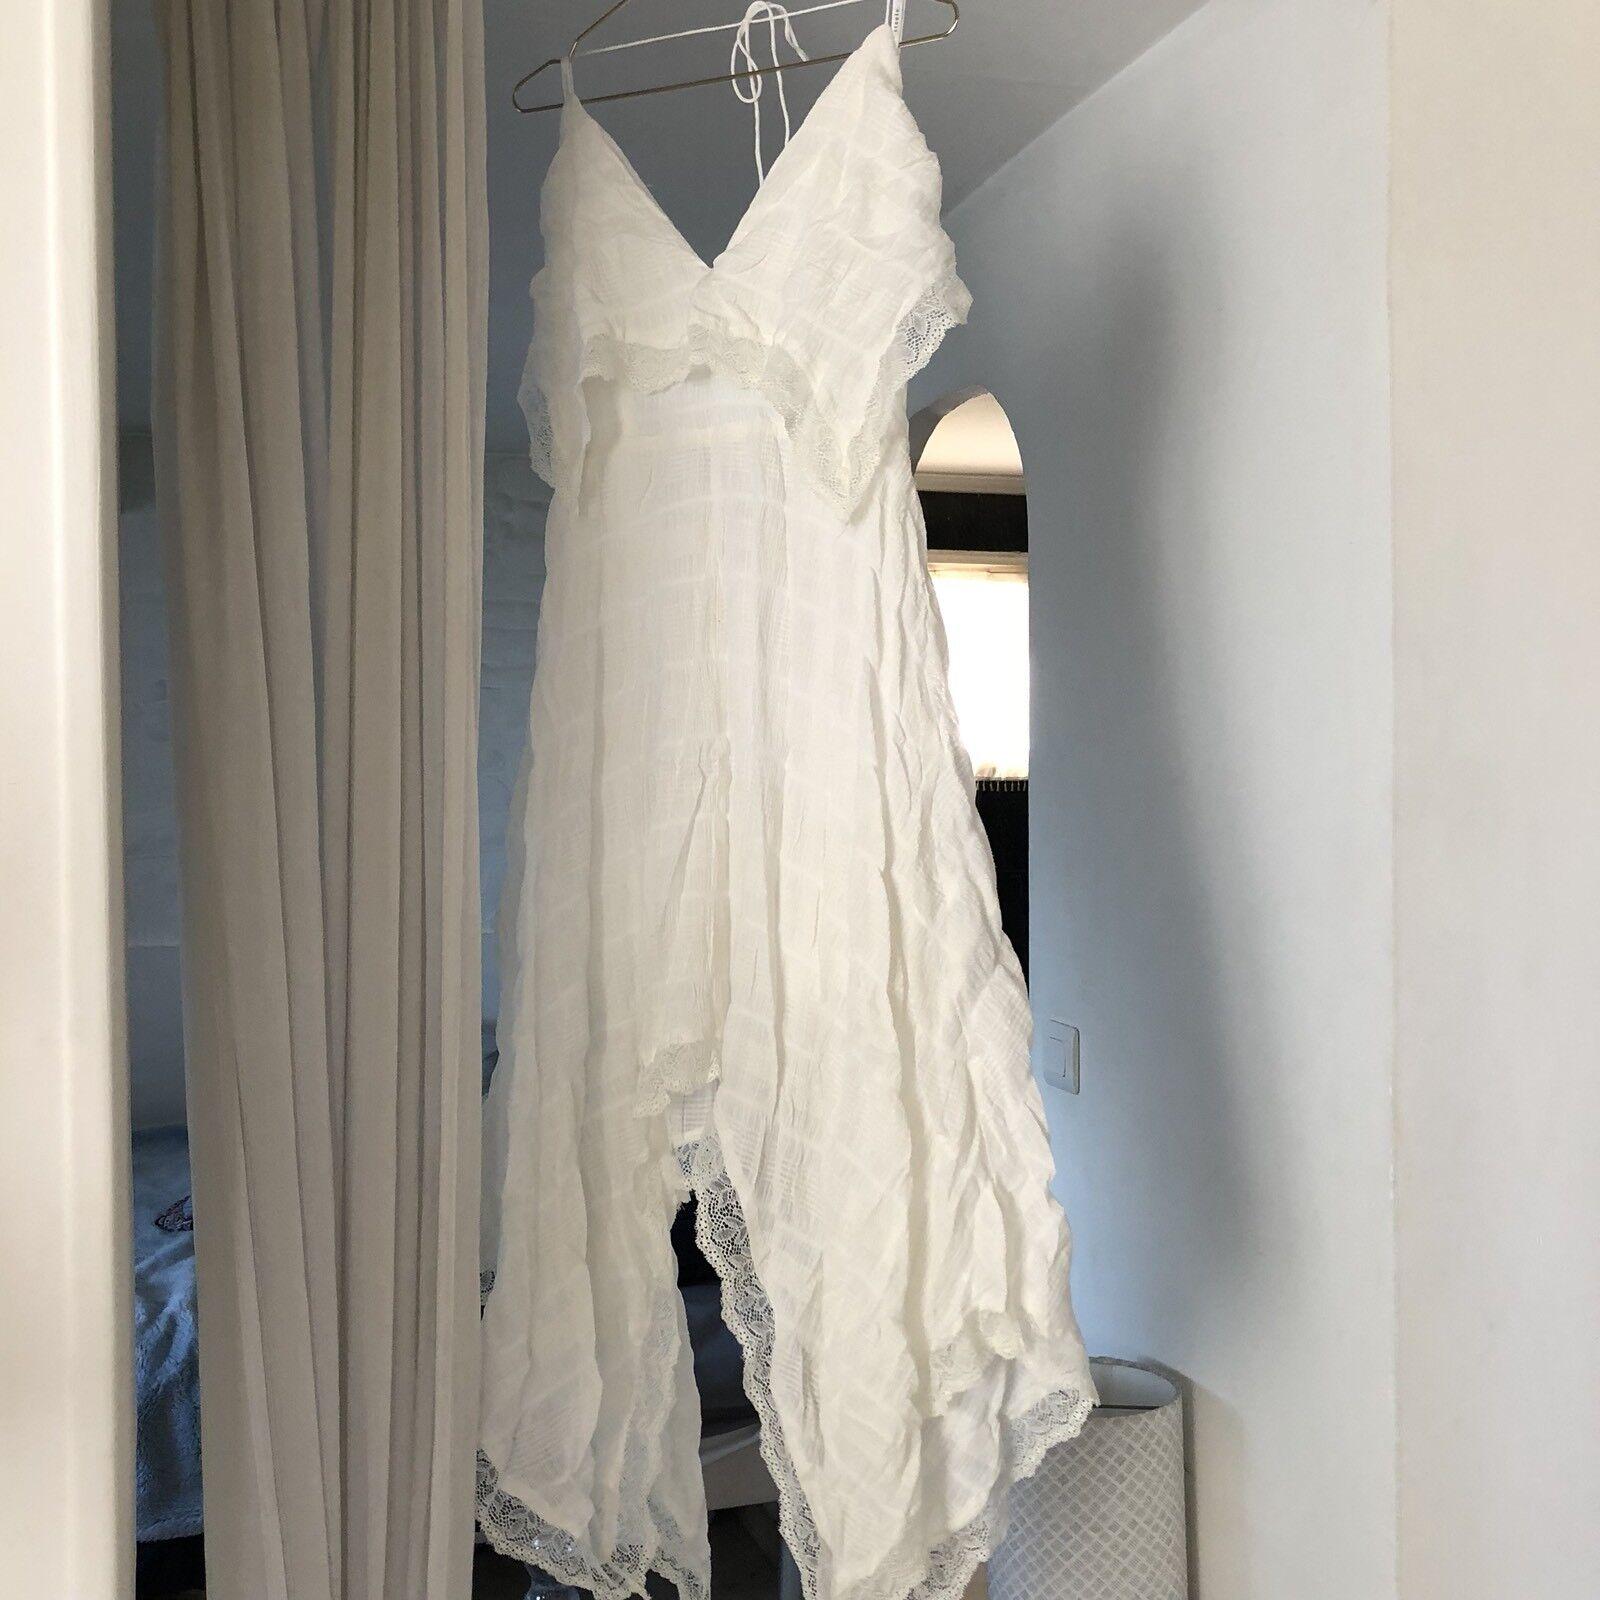 Steele Devin Dress Größe m